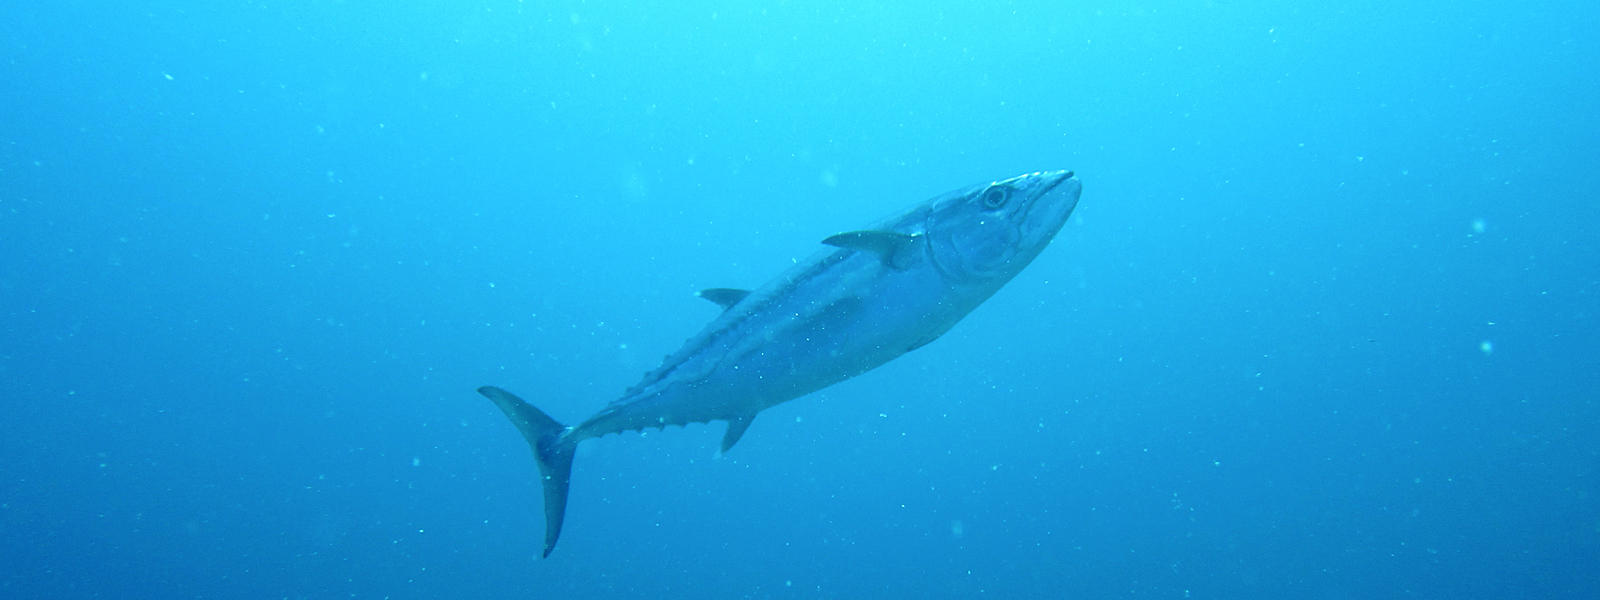 Cute Skipjack tuna wallpaper